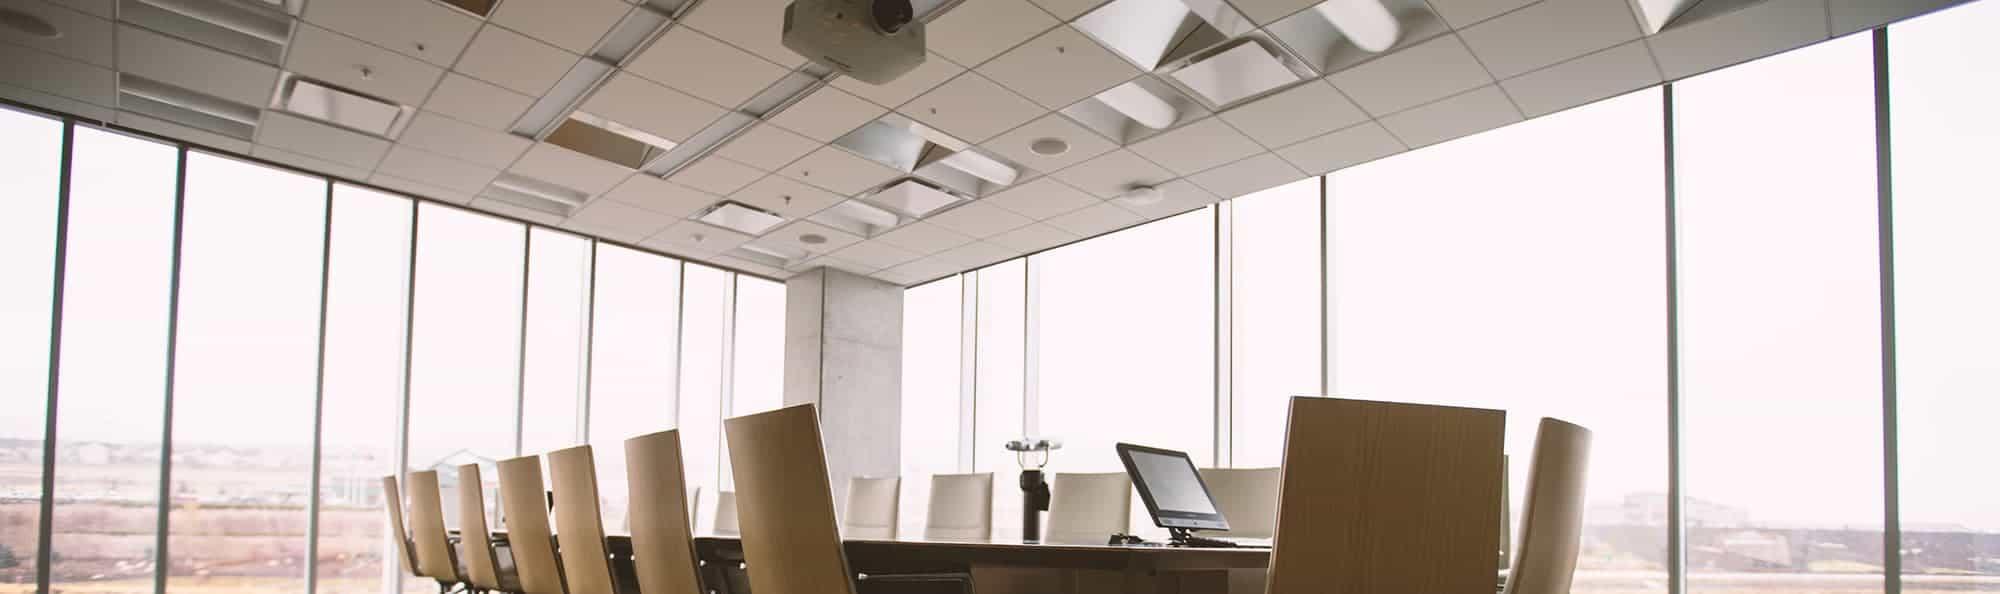 JCW Ceiling Soundproofinng Slide